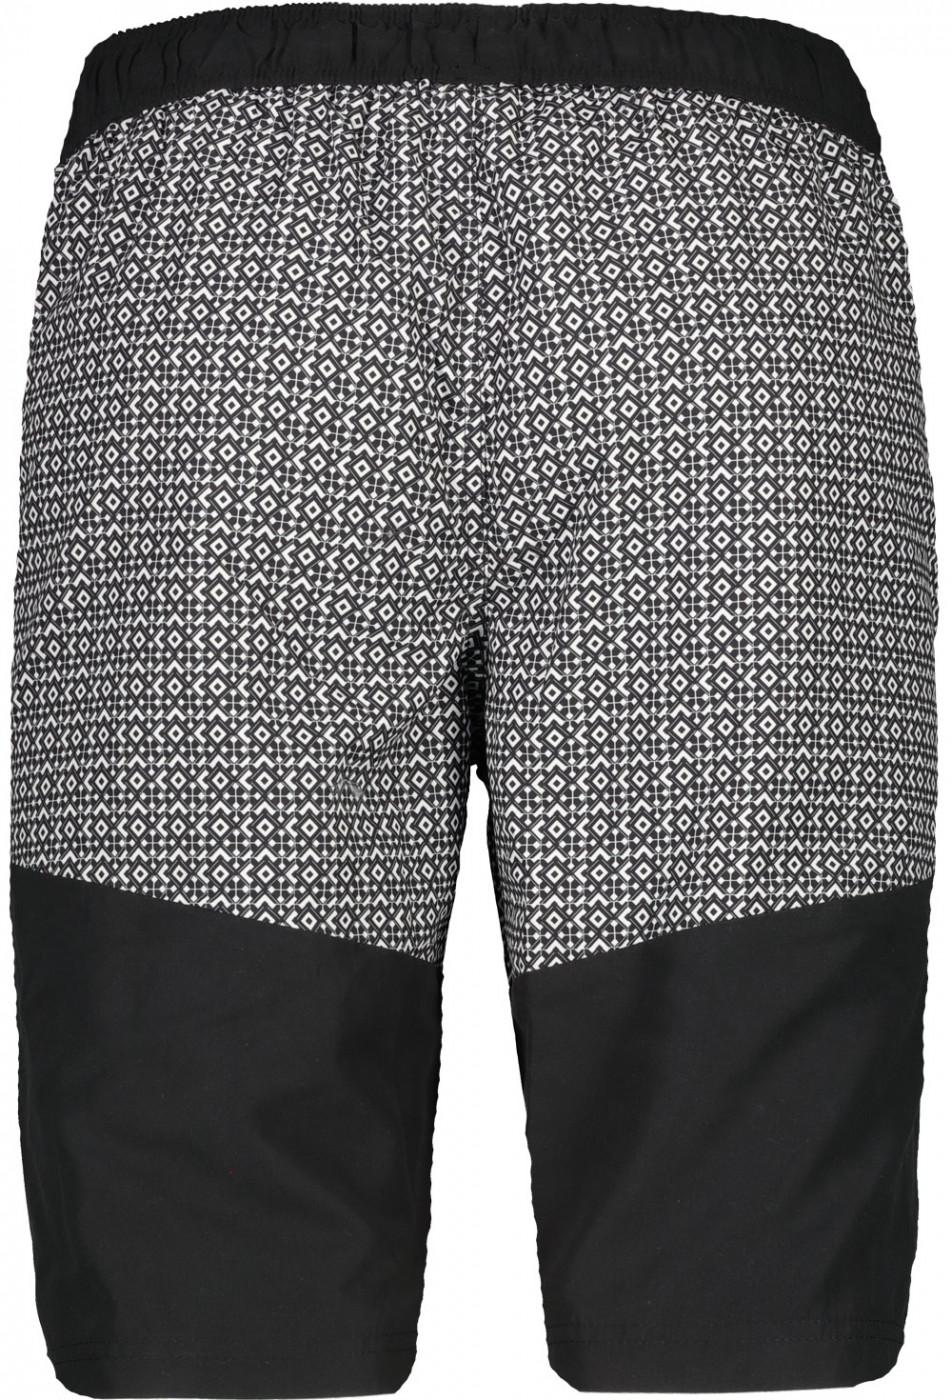 Men's Pants Sam73 Pats